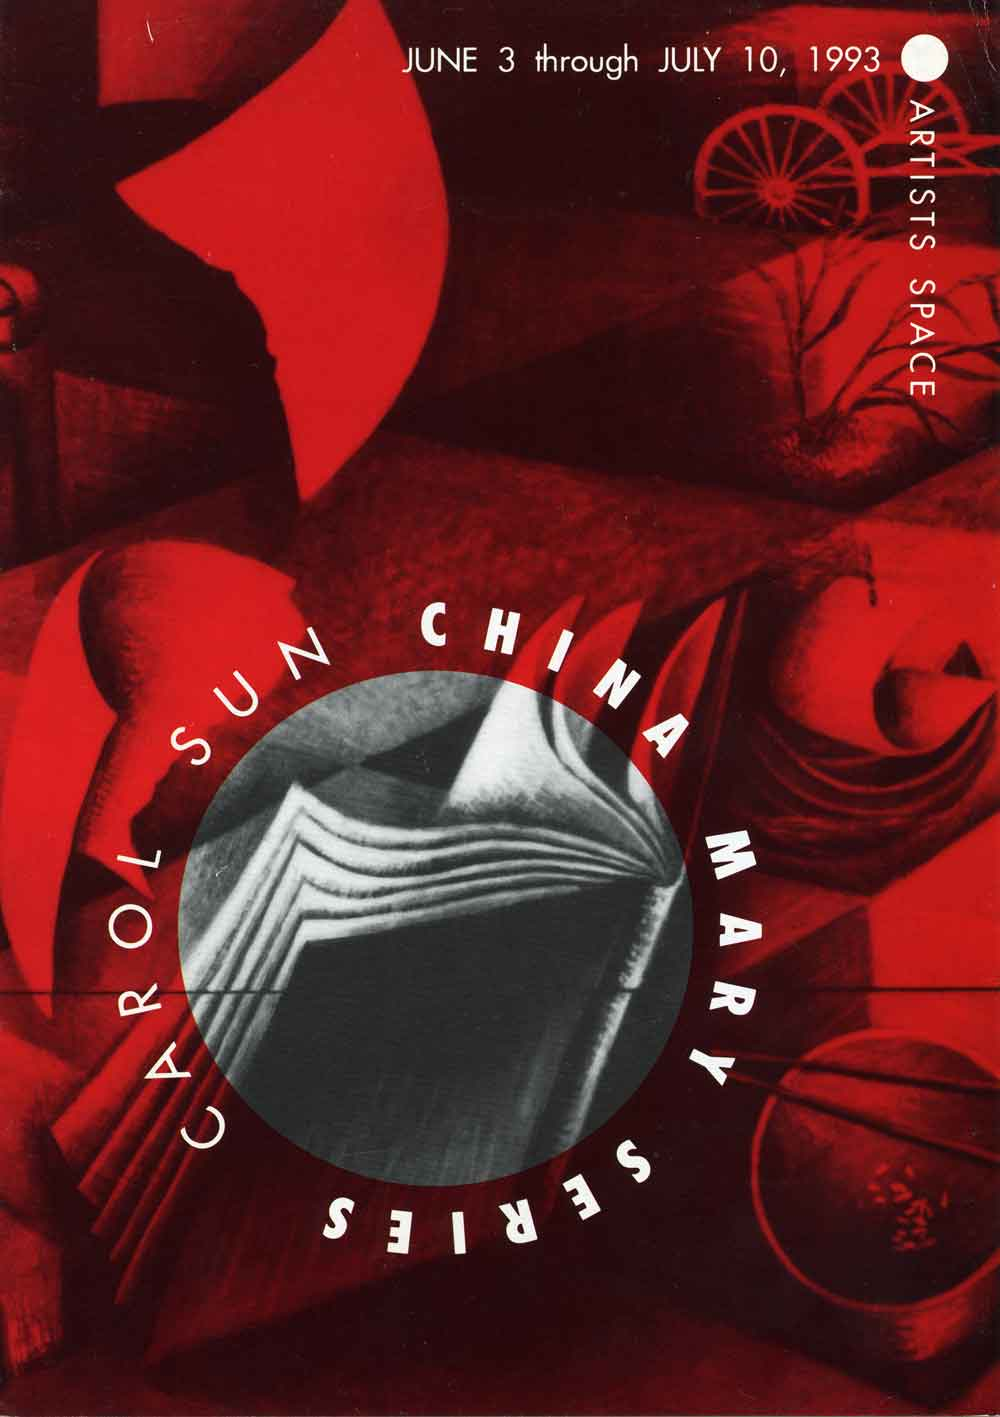 China Mary Series, pg 1